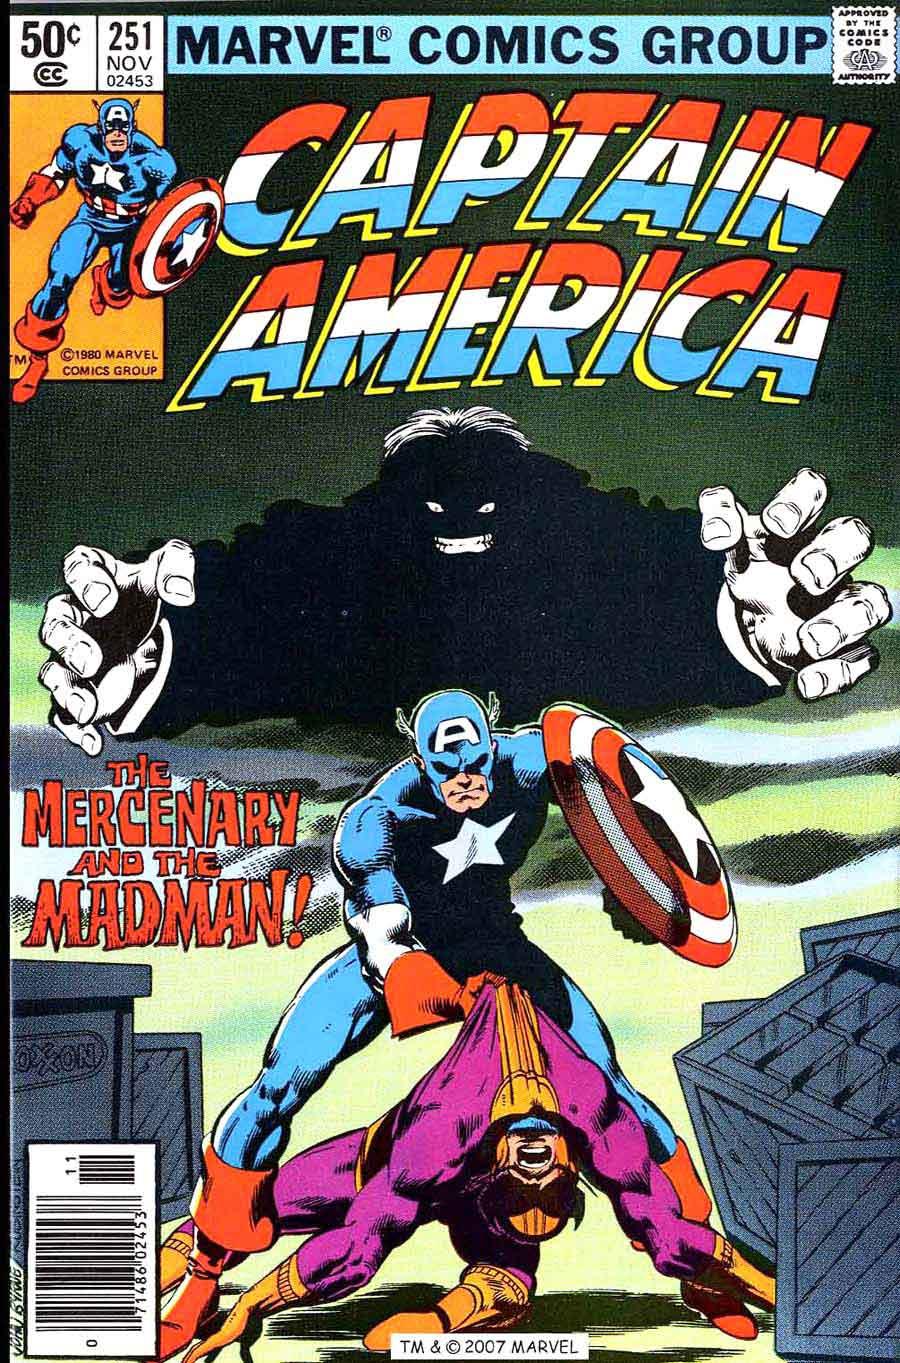 Captain America #251 marvel 1980s bronze age comic book cover art by John Byrne